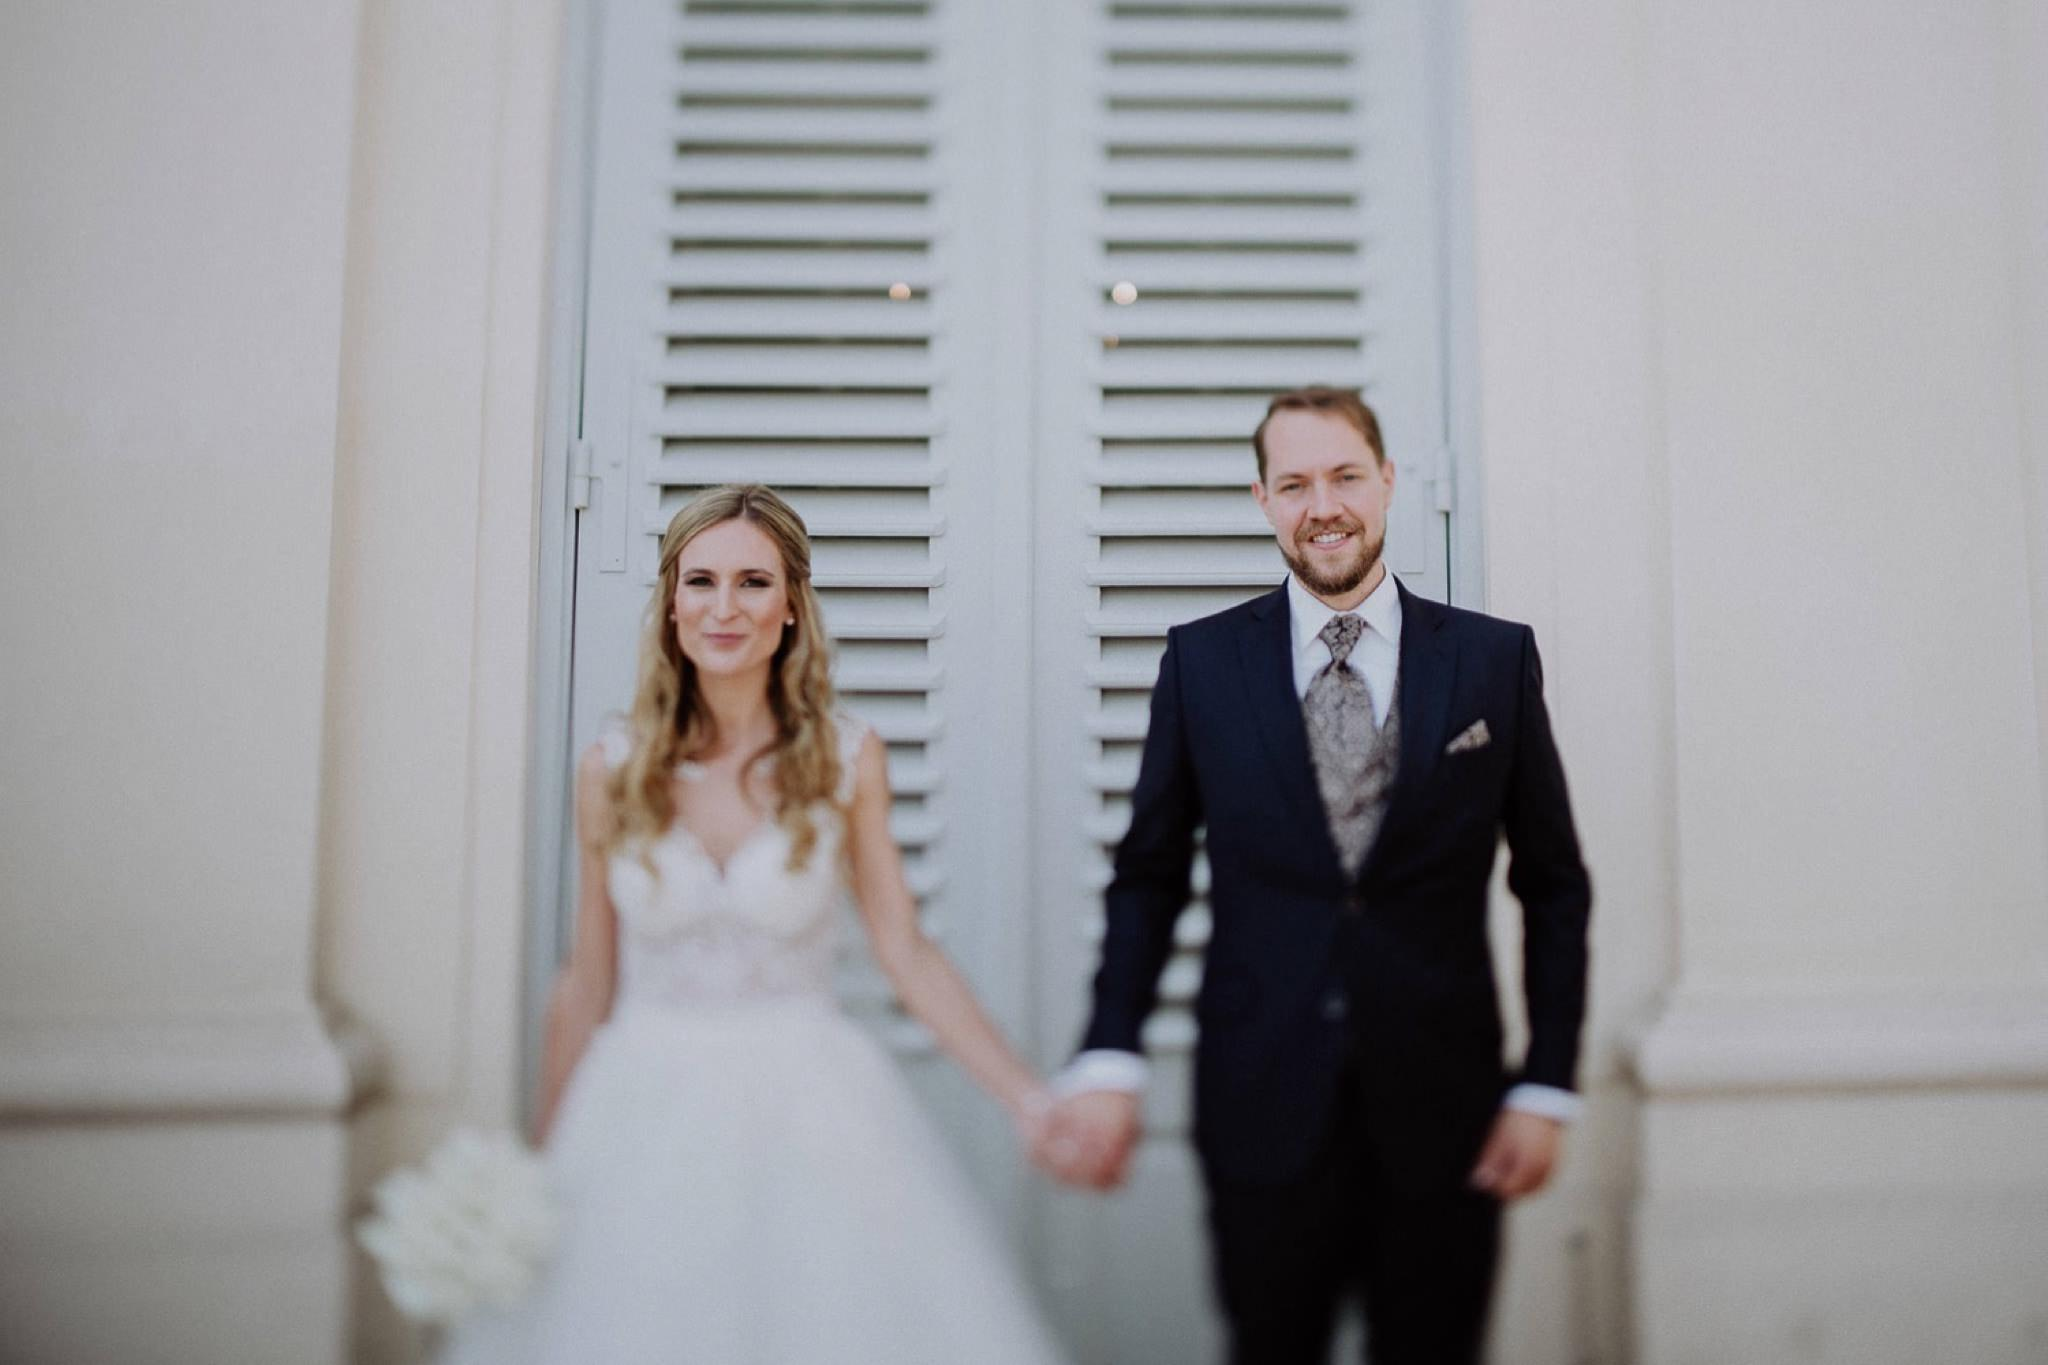 wedding photographer hamilton new zealand 1016 2